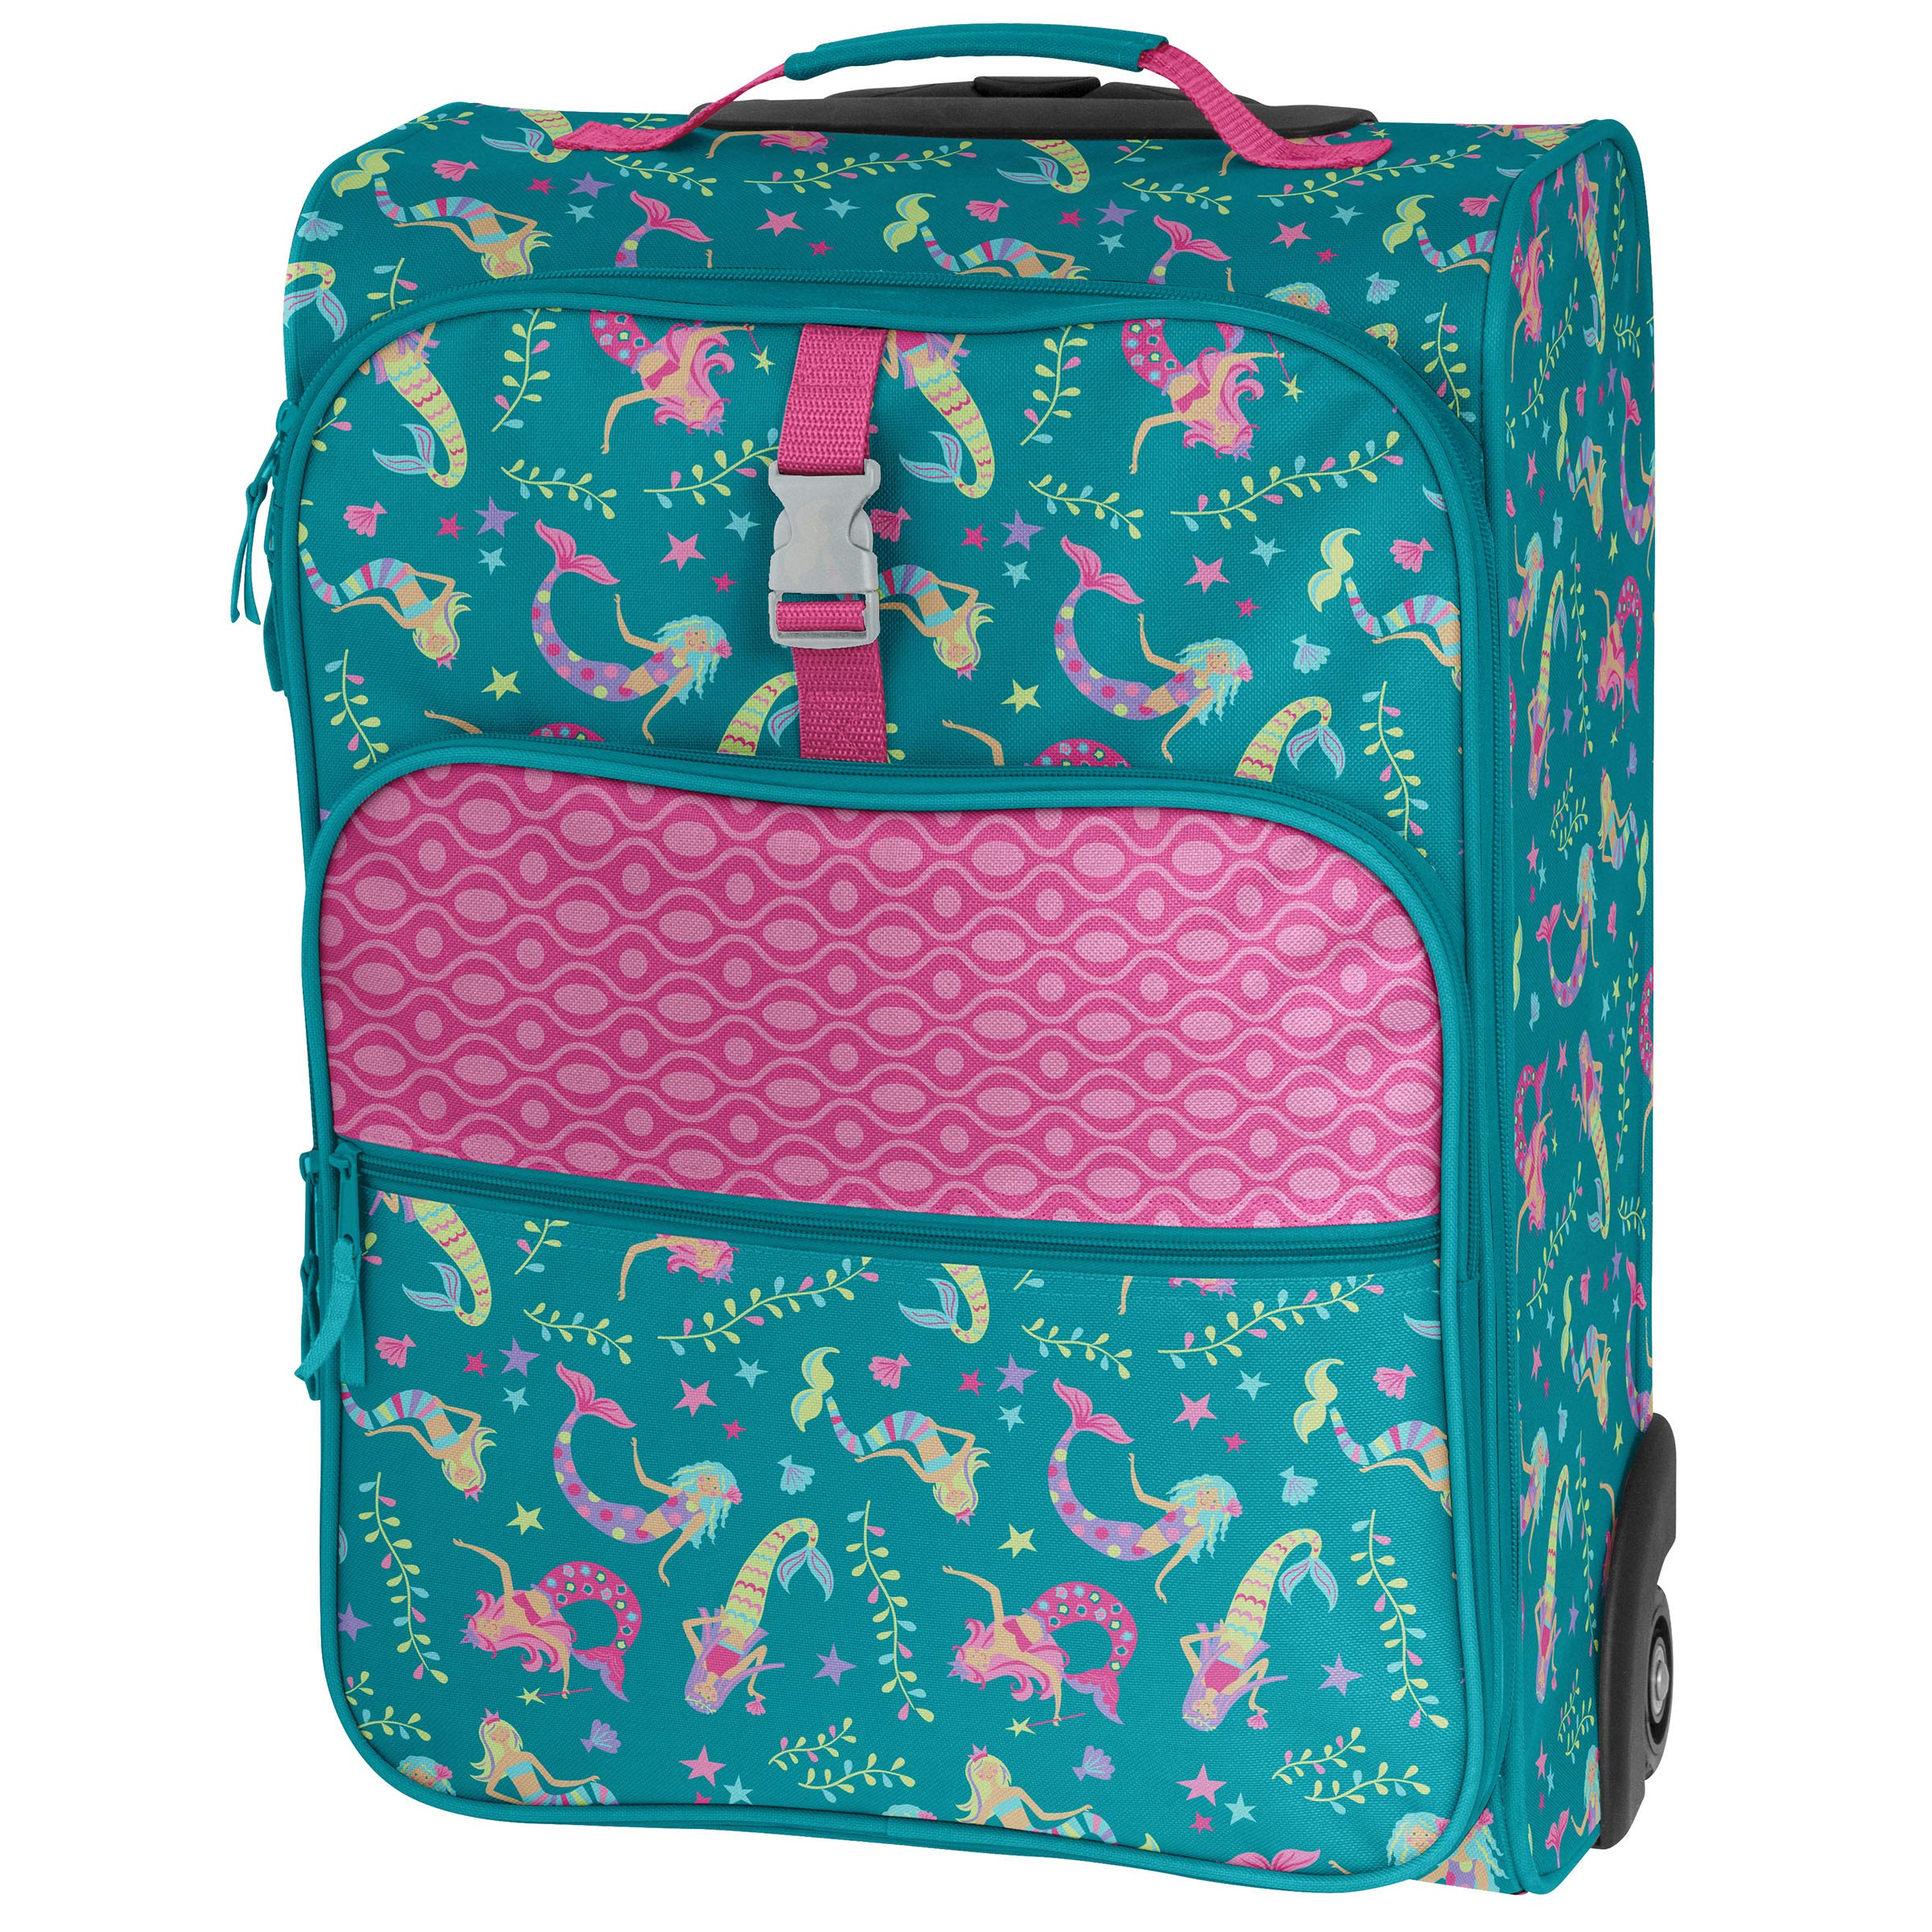 Stephen Joseph All Over Print Luggage, Mermaid